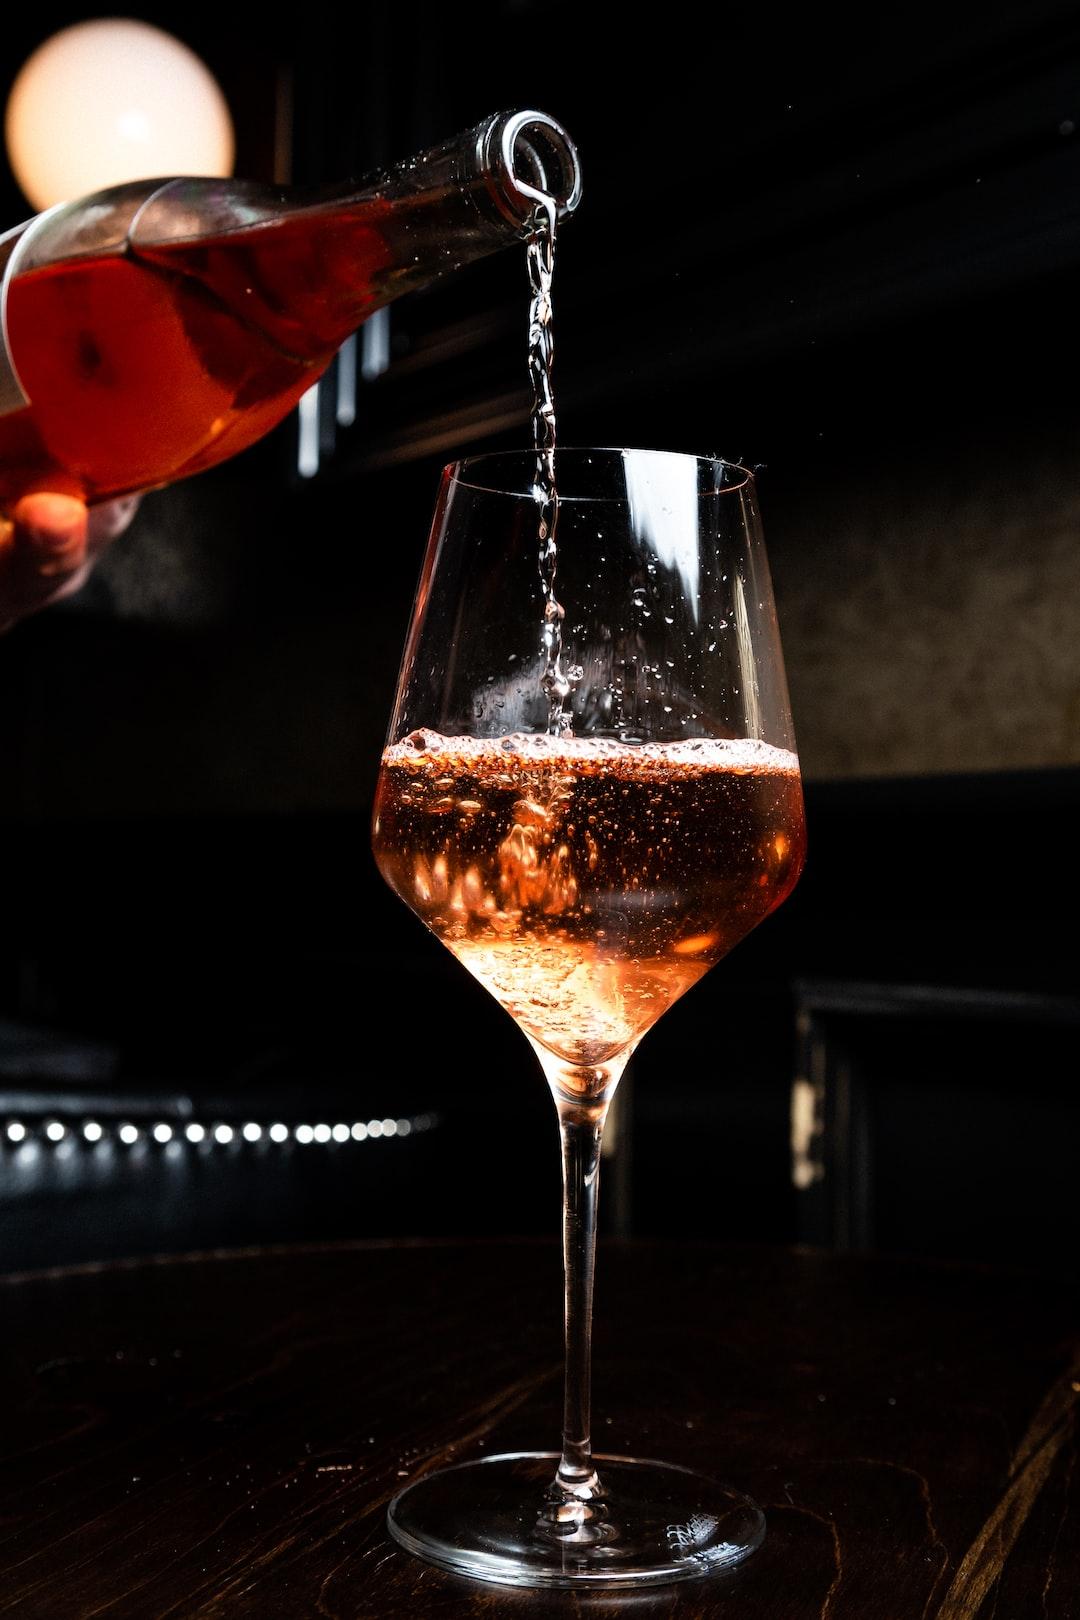 Enjoying a nice glass of bubbly